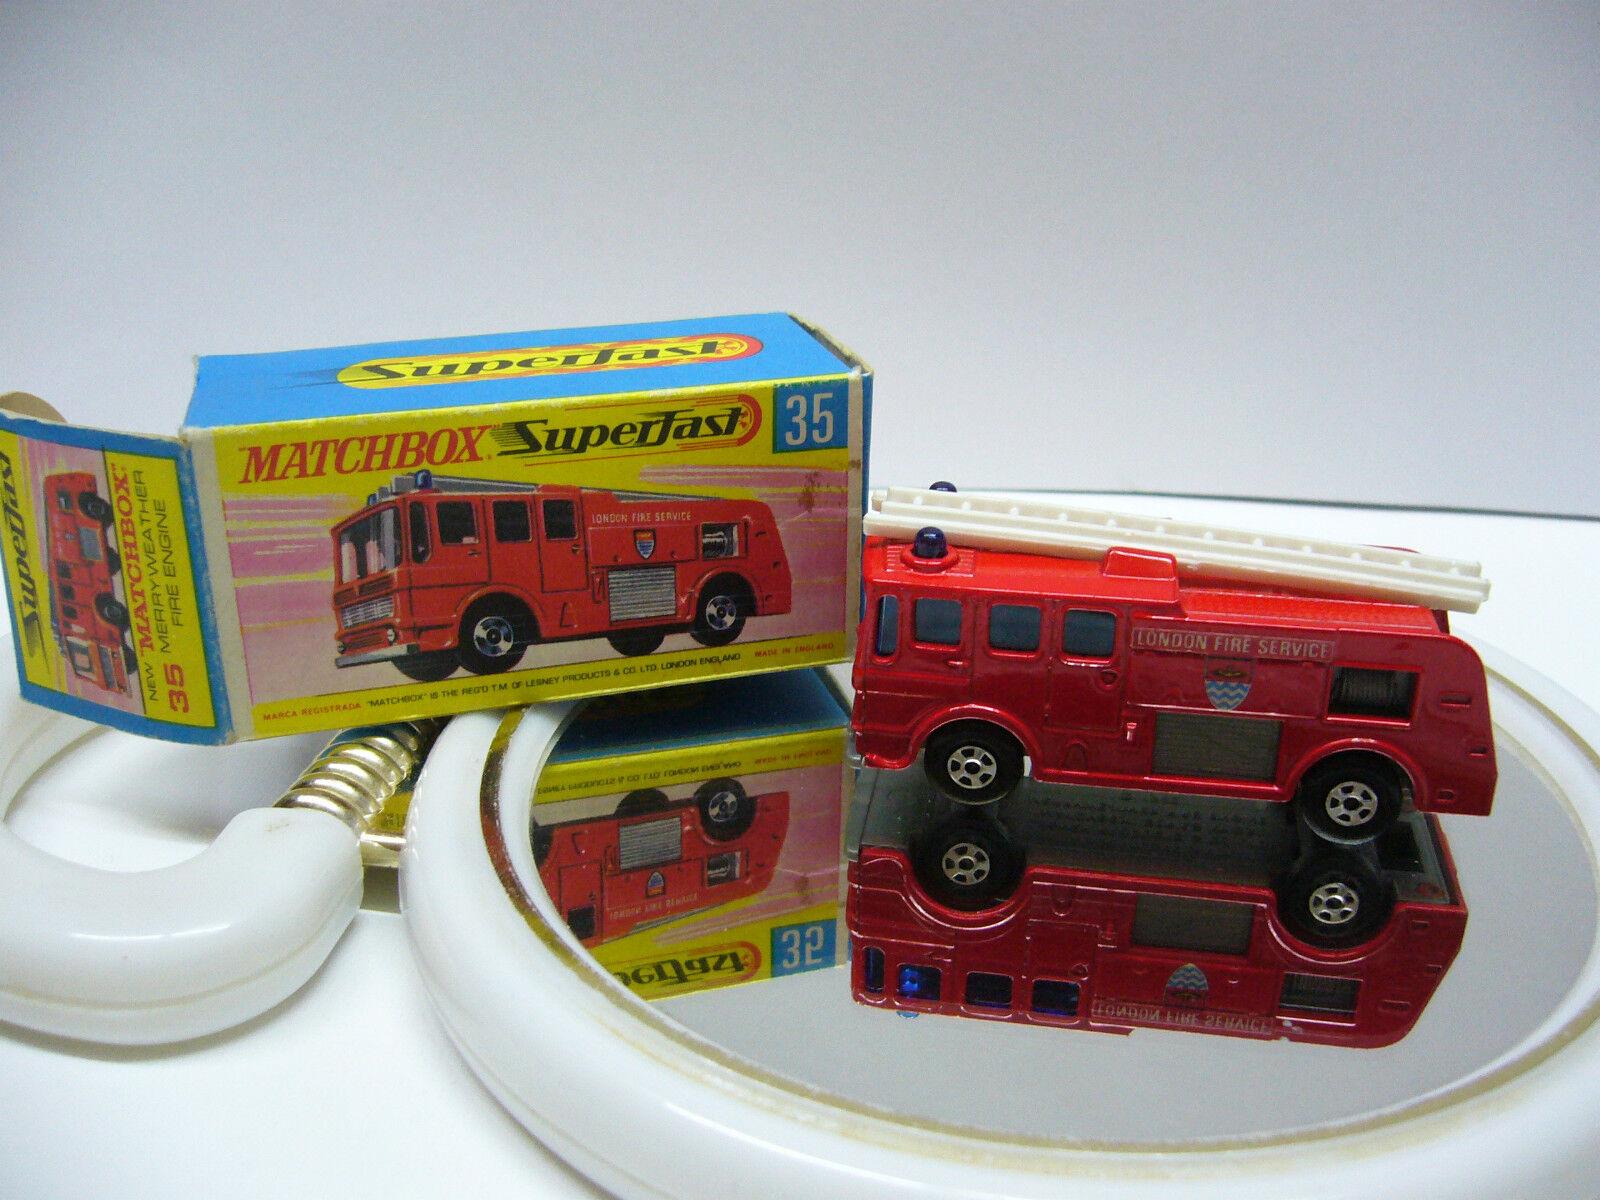 tienda en linea Matchbox súperfast MB 35 Merry Merry Merry Weather Fire Engine-rojo-made en Inglaterra  Envío 100% gratuito